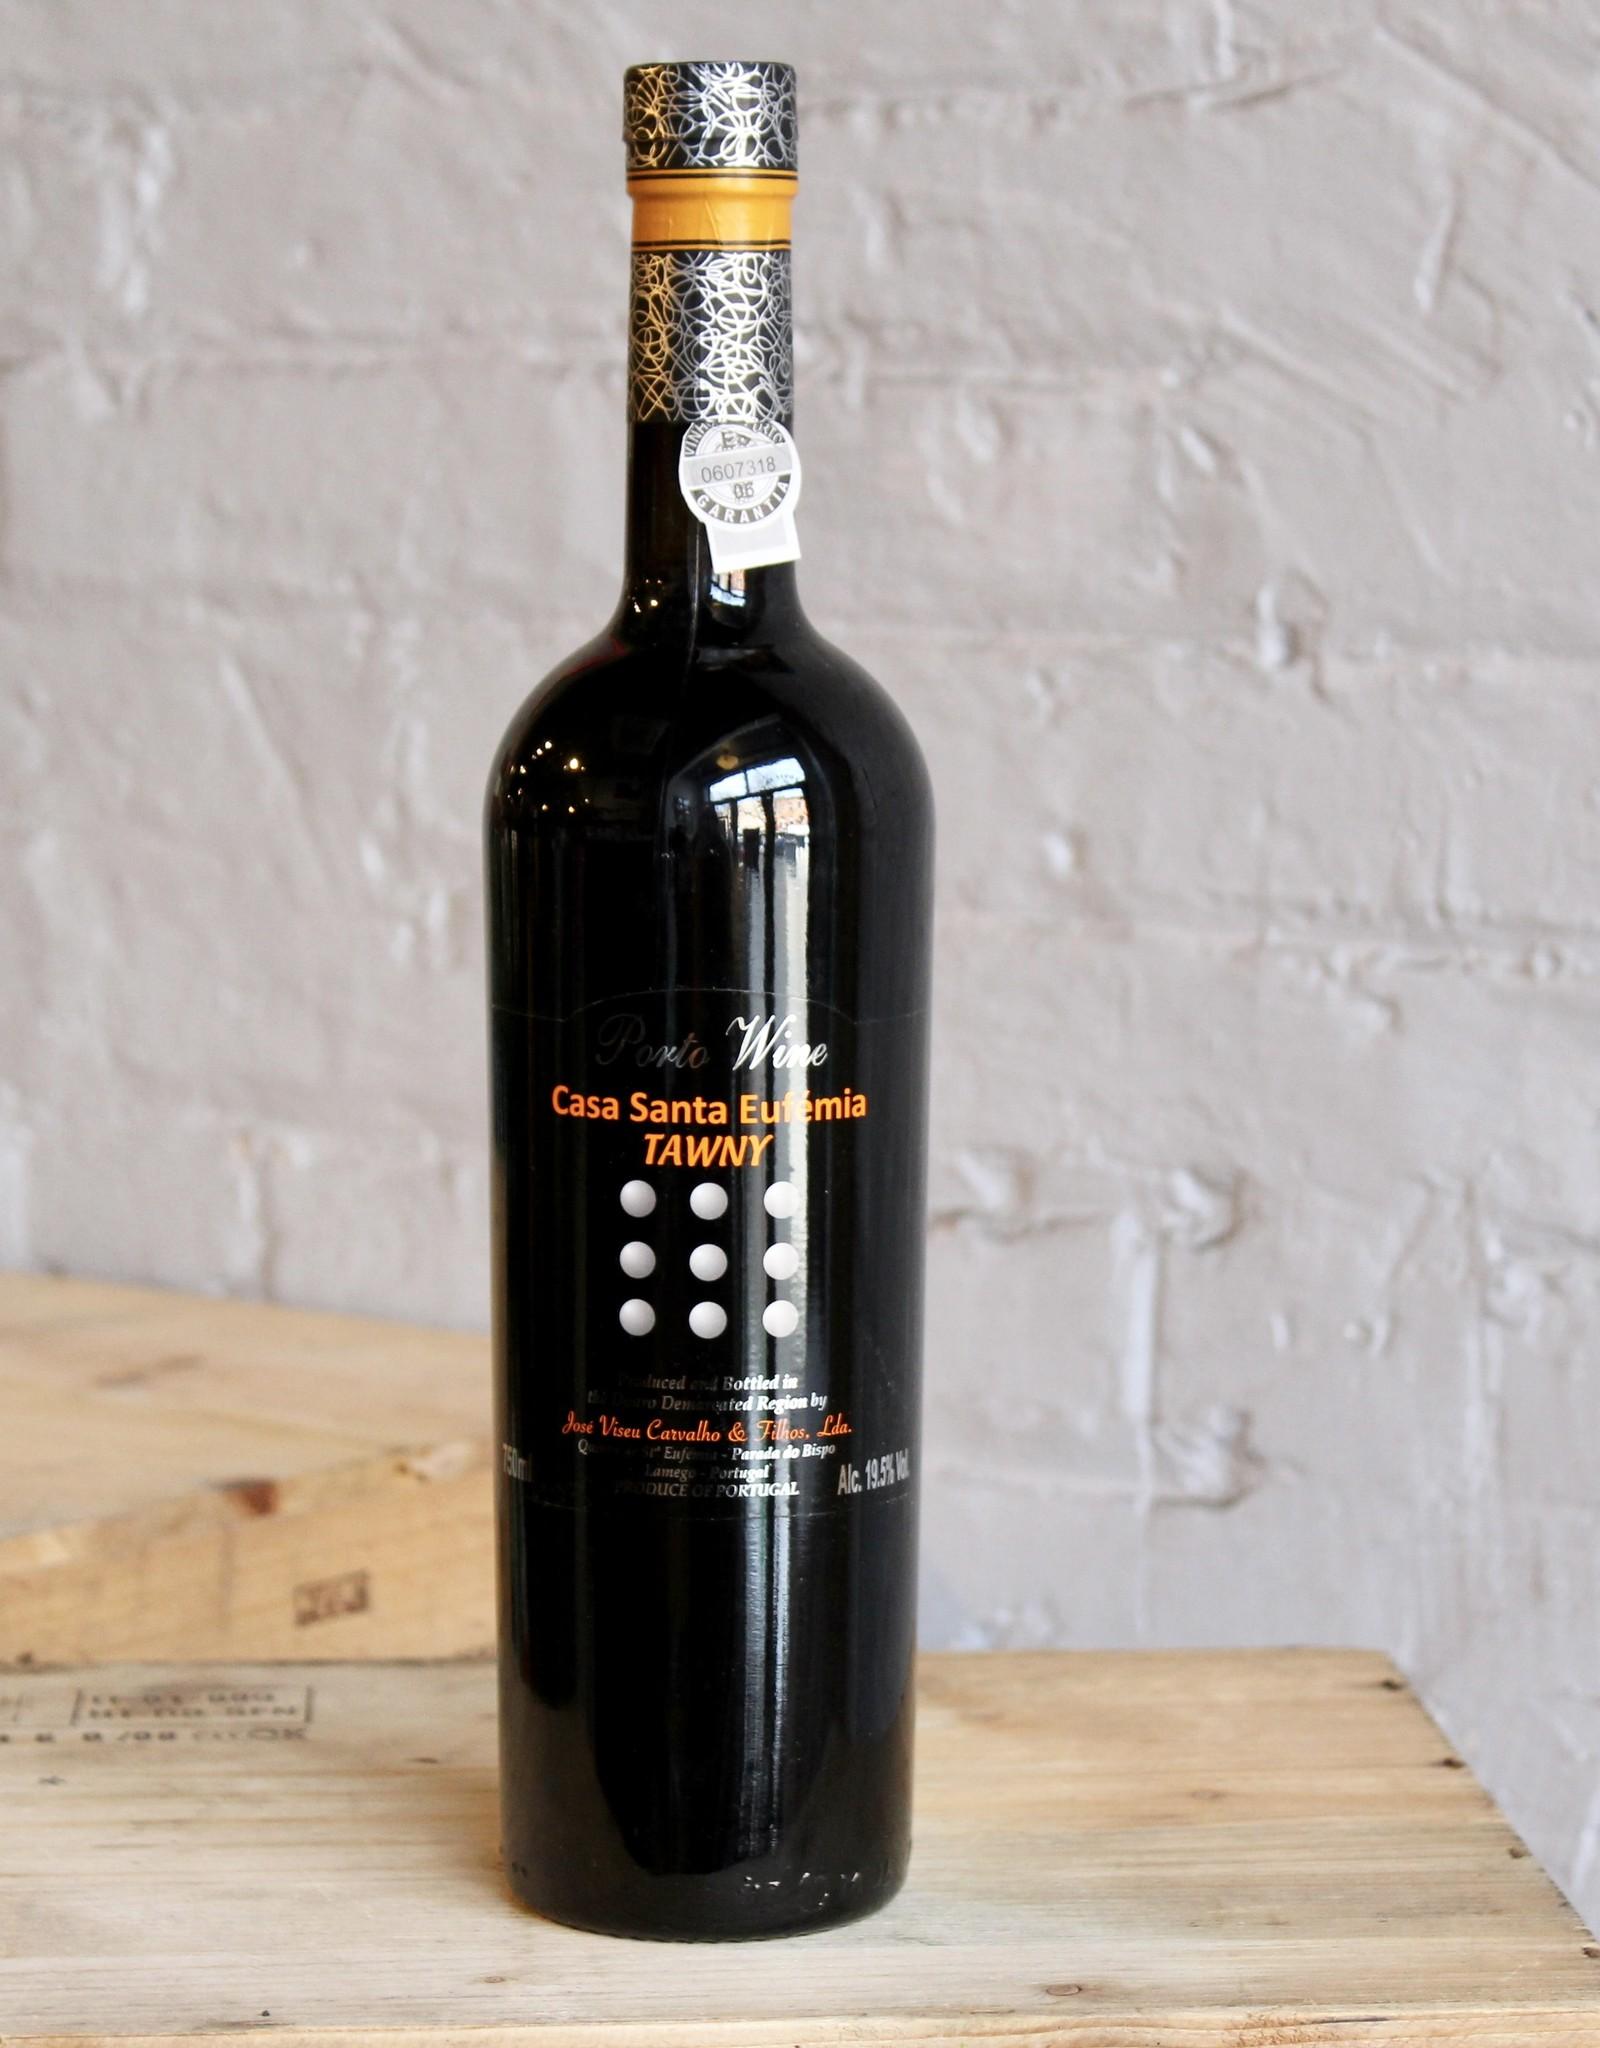 Wine NV Casa de Santa Eufemia Tawny Port - Portugal